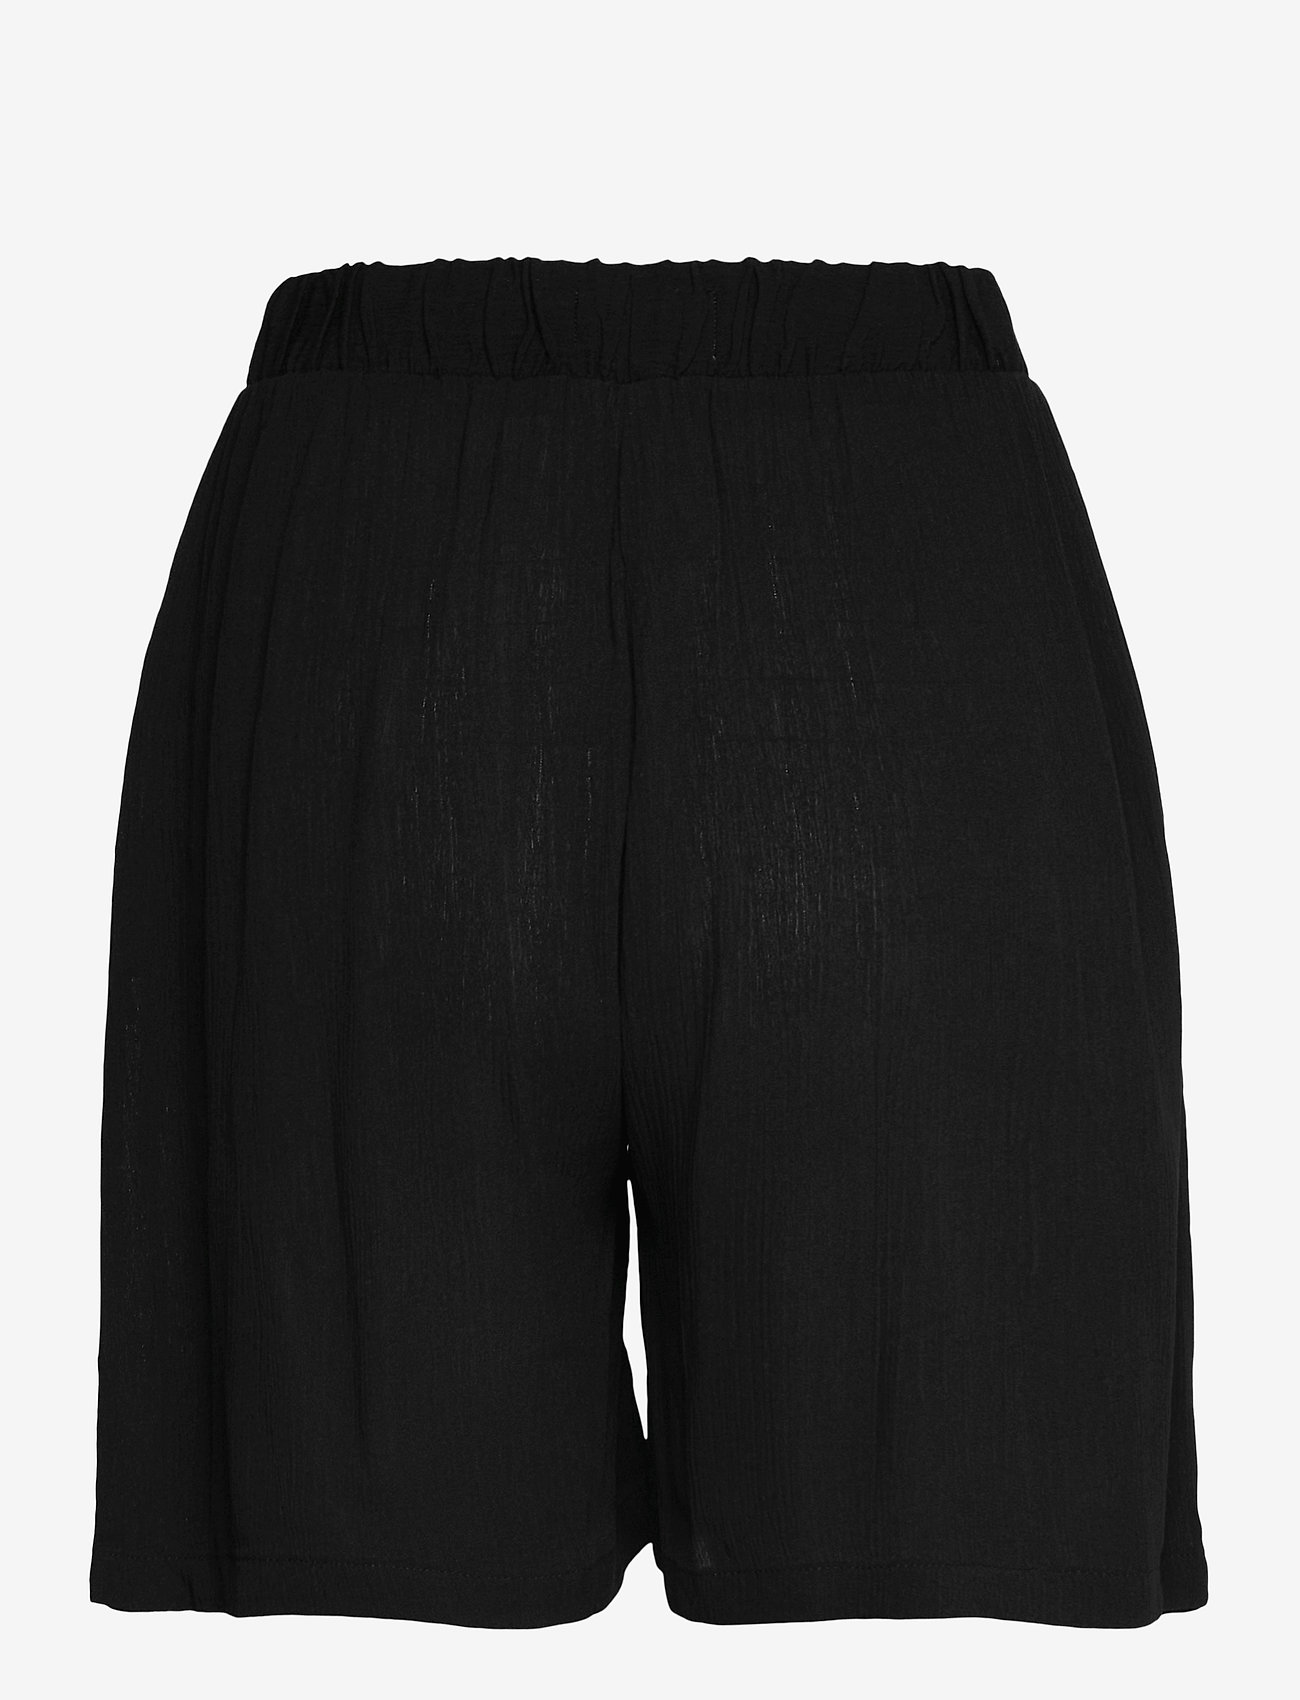 ICHI - IHMARRAKECH SO SHO3 - casual shorts - black - 1